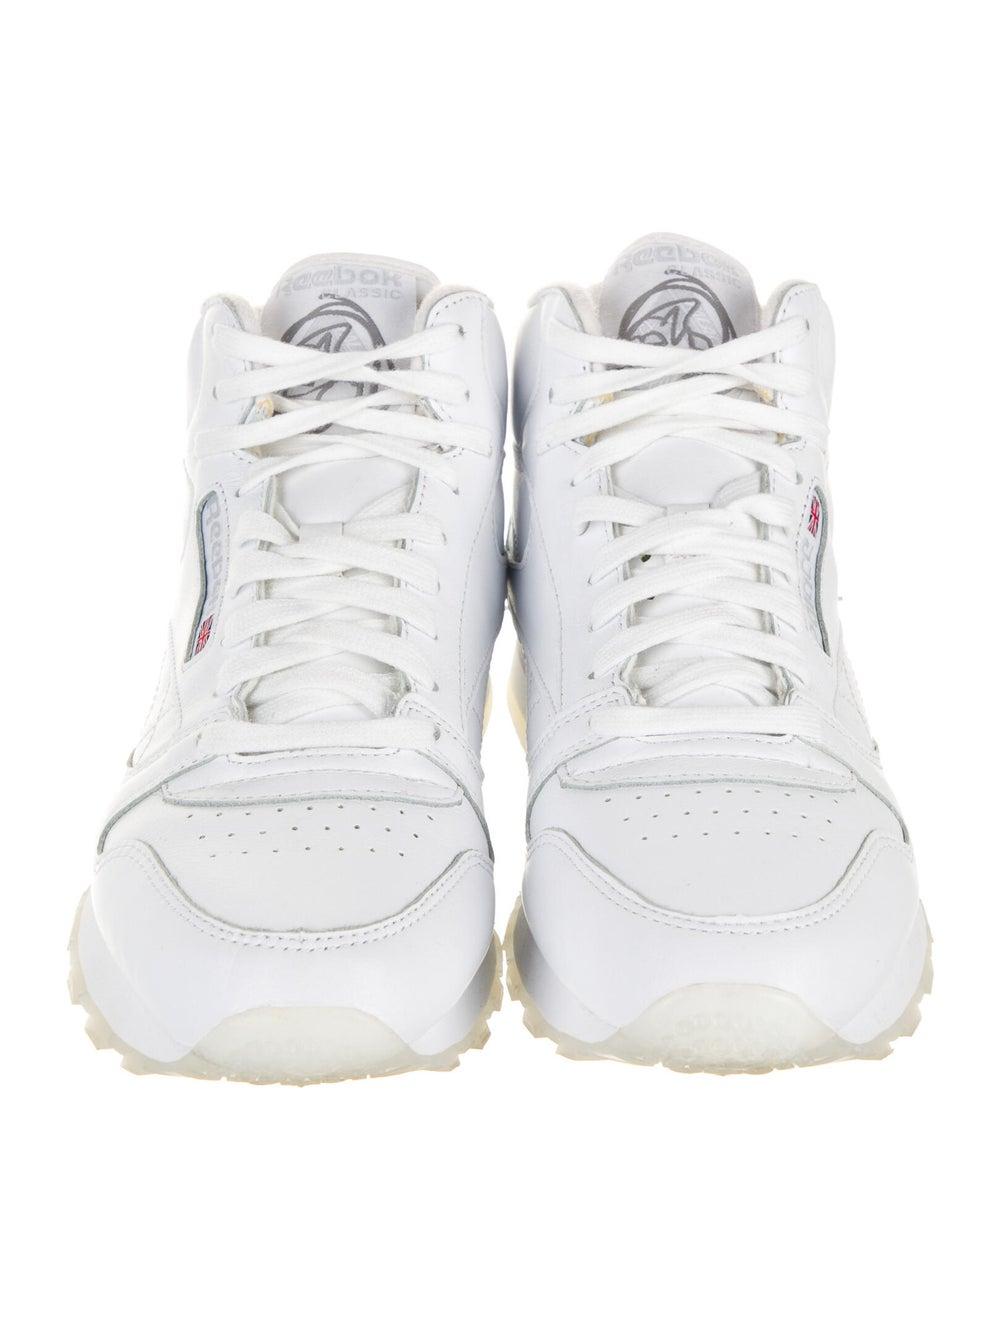 Palace Skateboards x Reebok JK Workout Sneakers S… - image 3